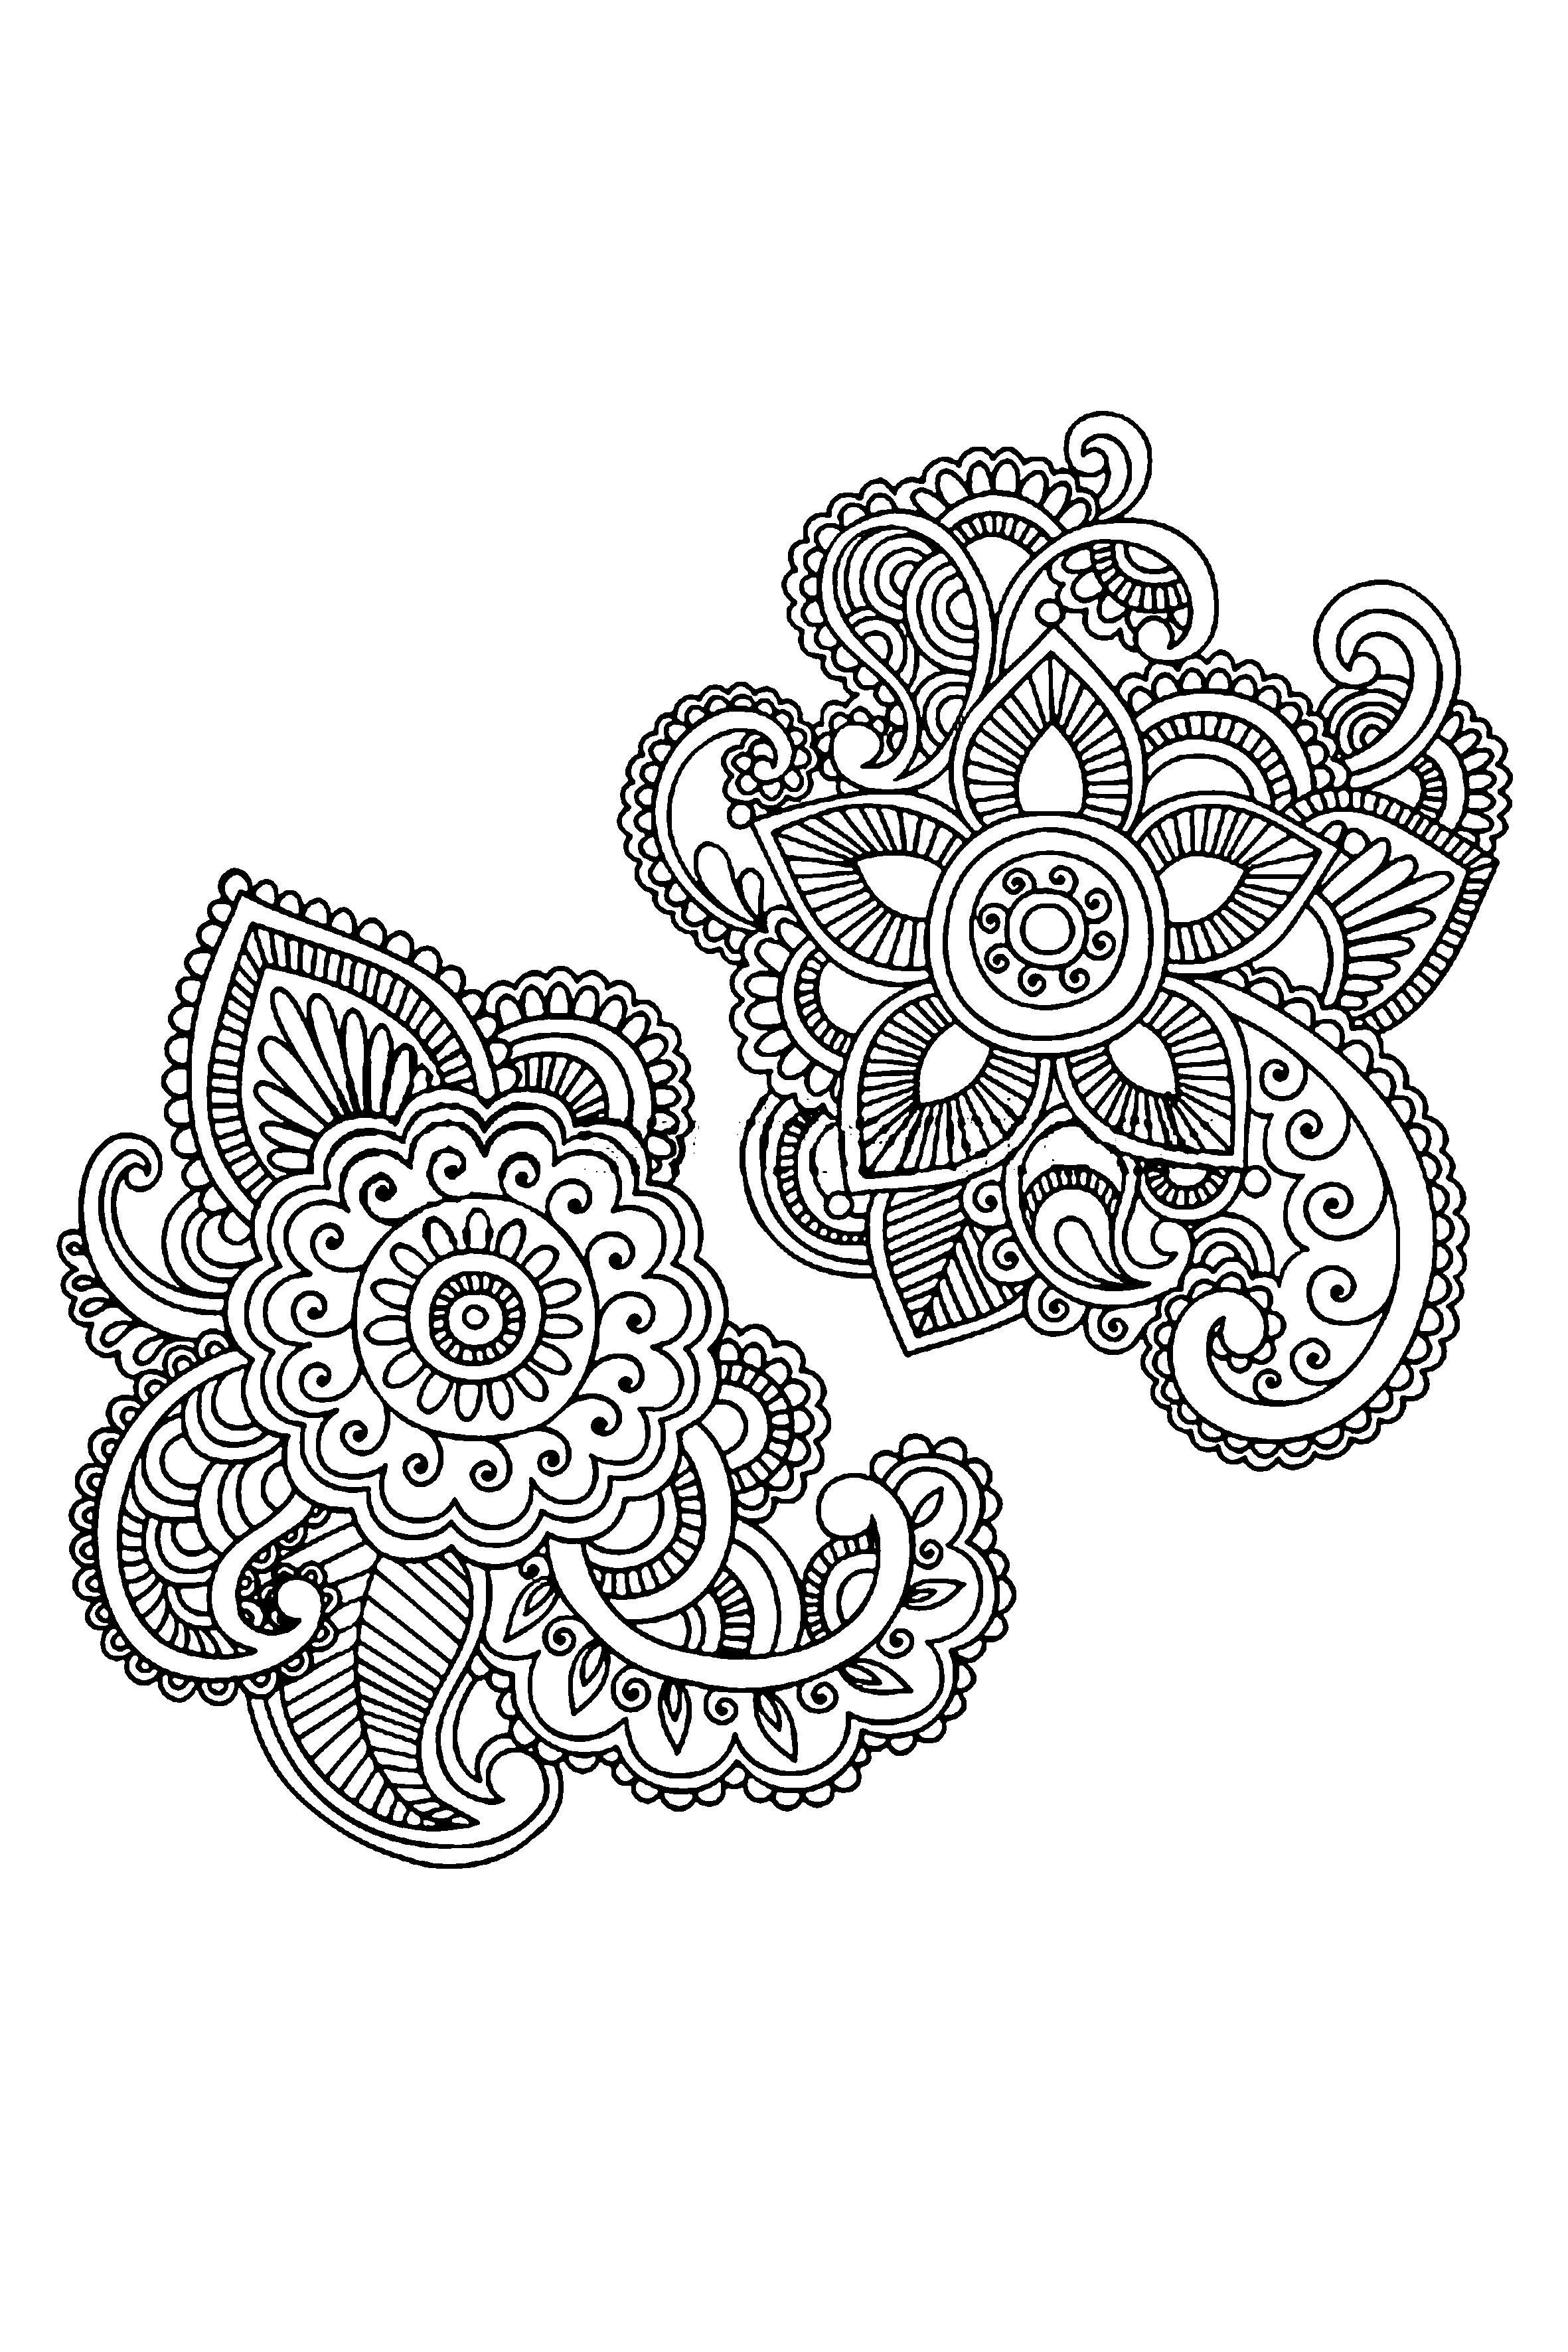 Pin By Melissa Riccio On Doodles